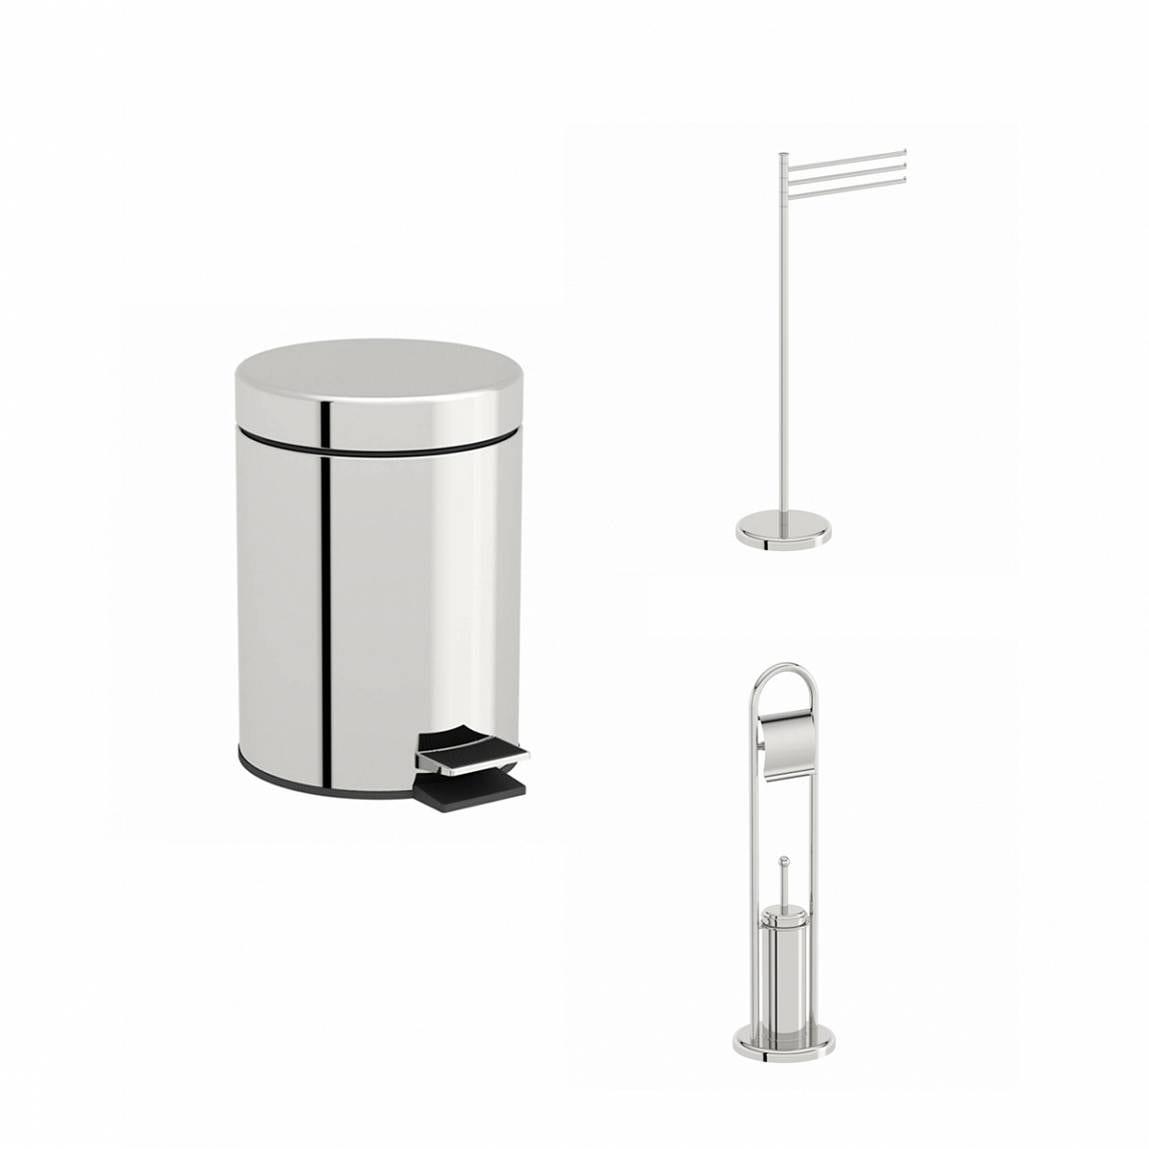 Orchard Options stainless steel bathroom organiser set